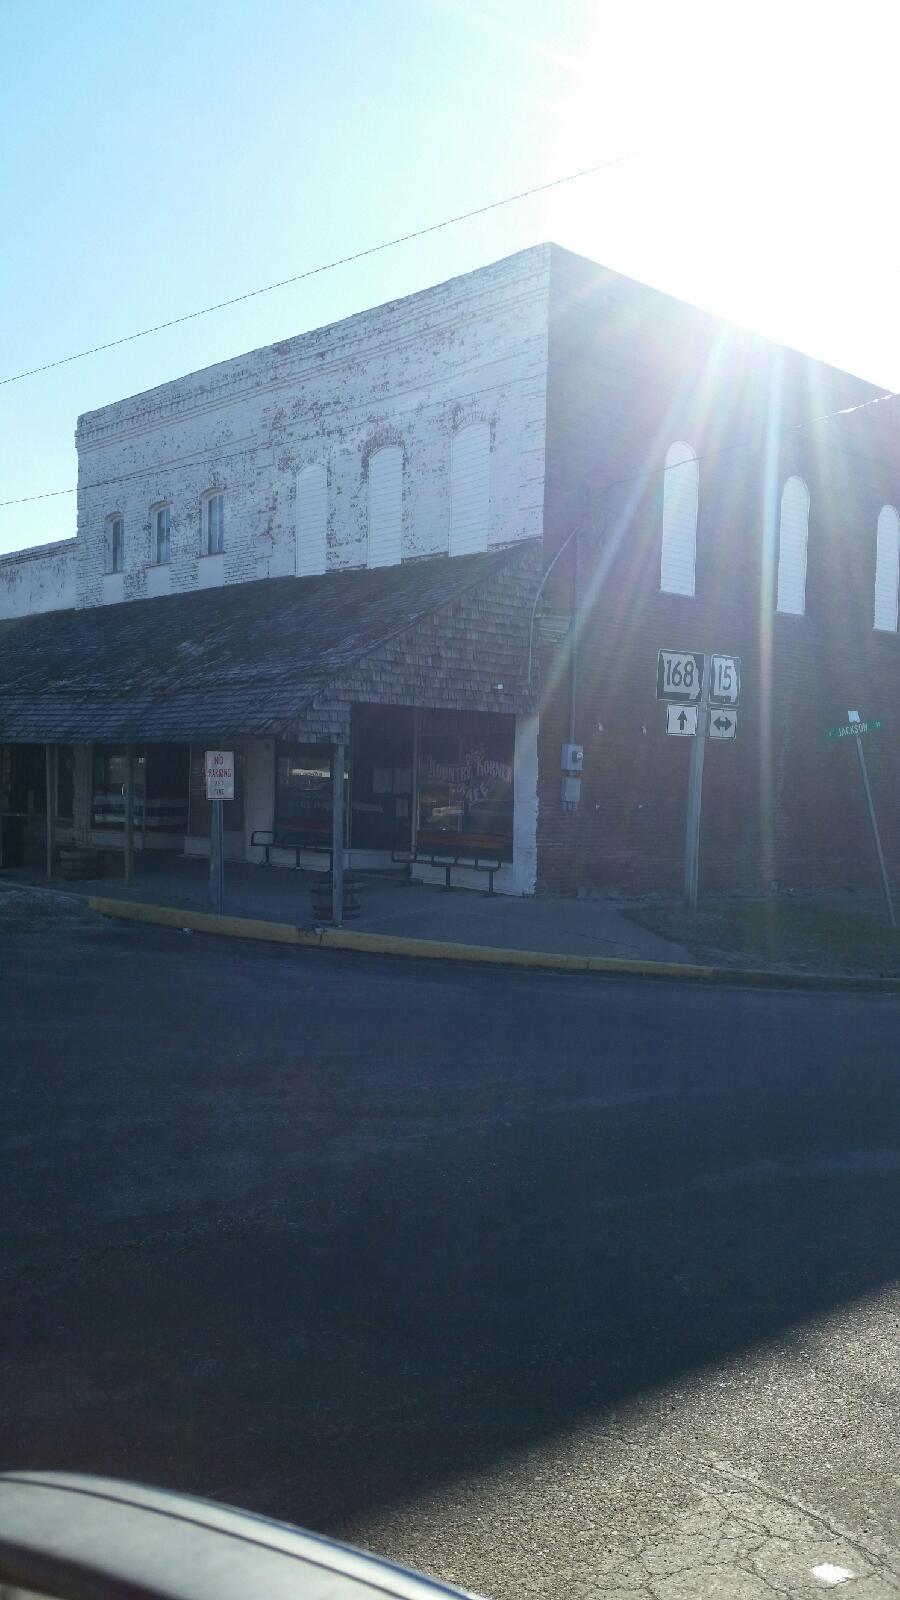 101 E. Main, Shelbyville, Missouri 63469